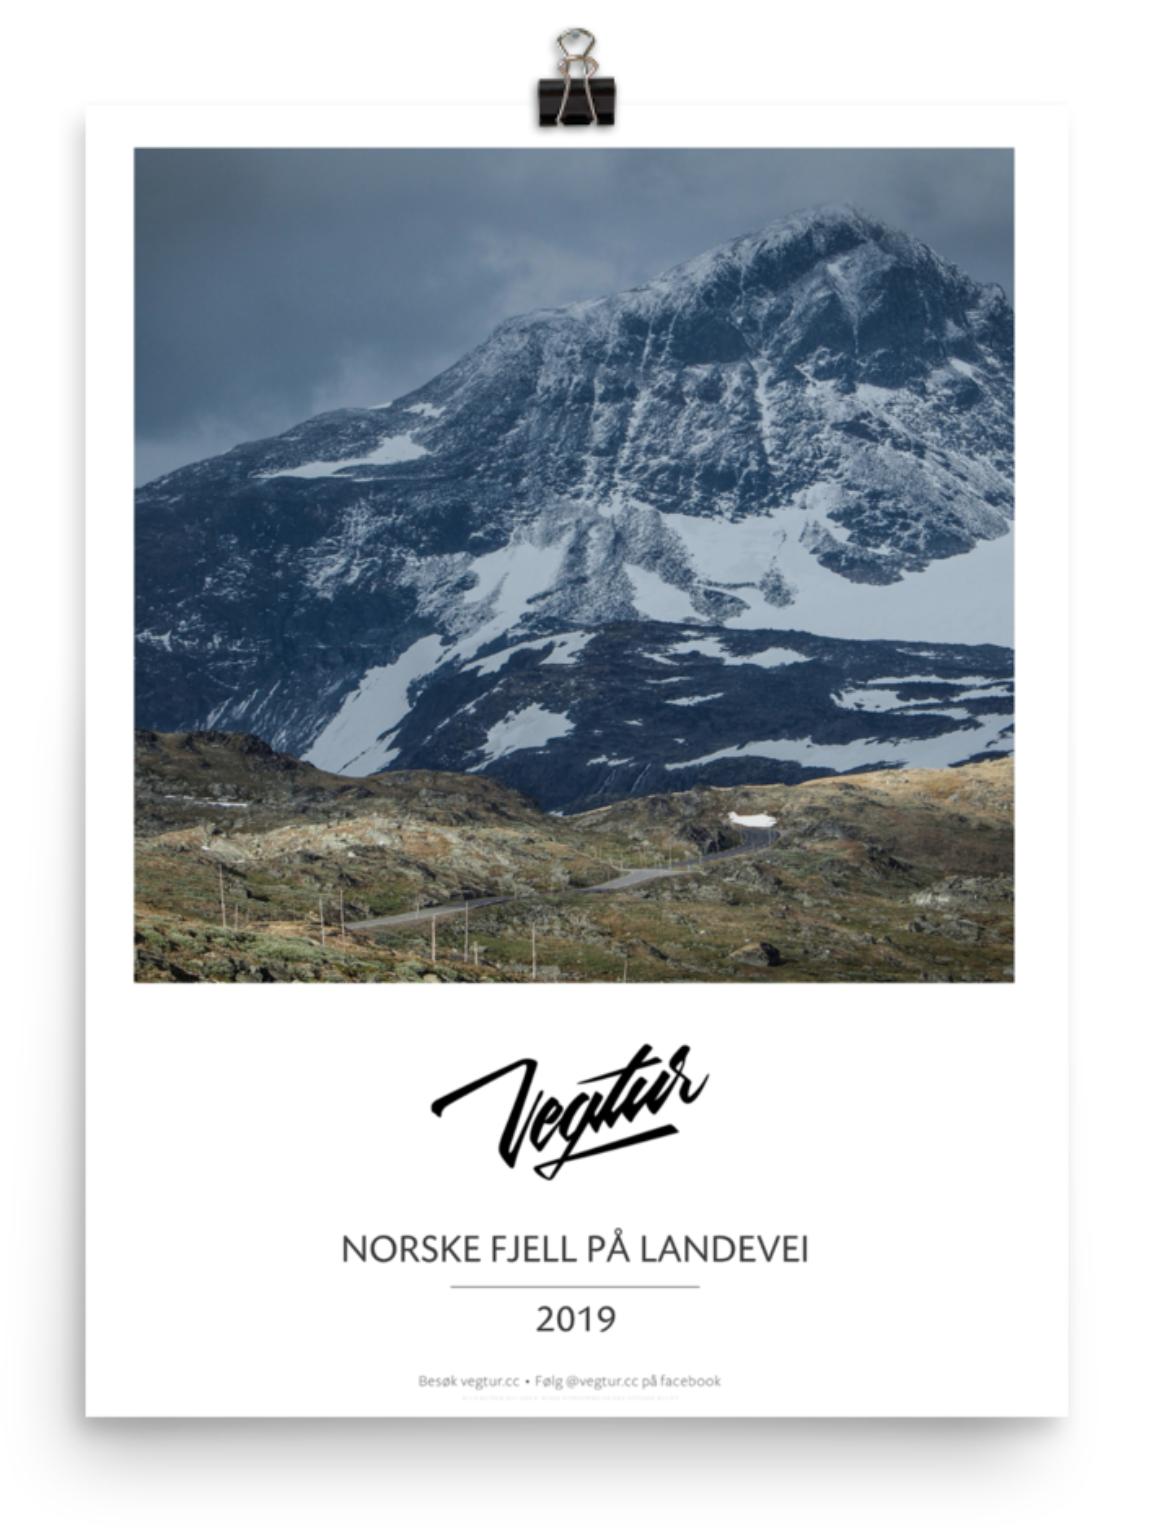 vegtur_kalender_2019_norskefjellpalandevei.png